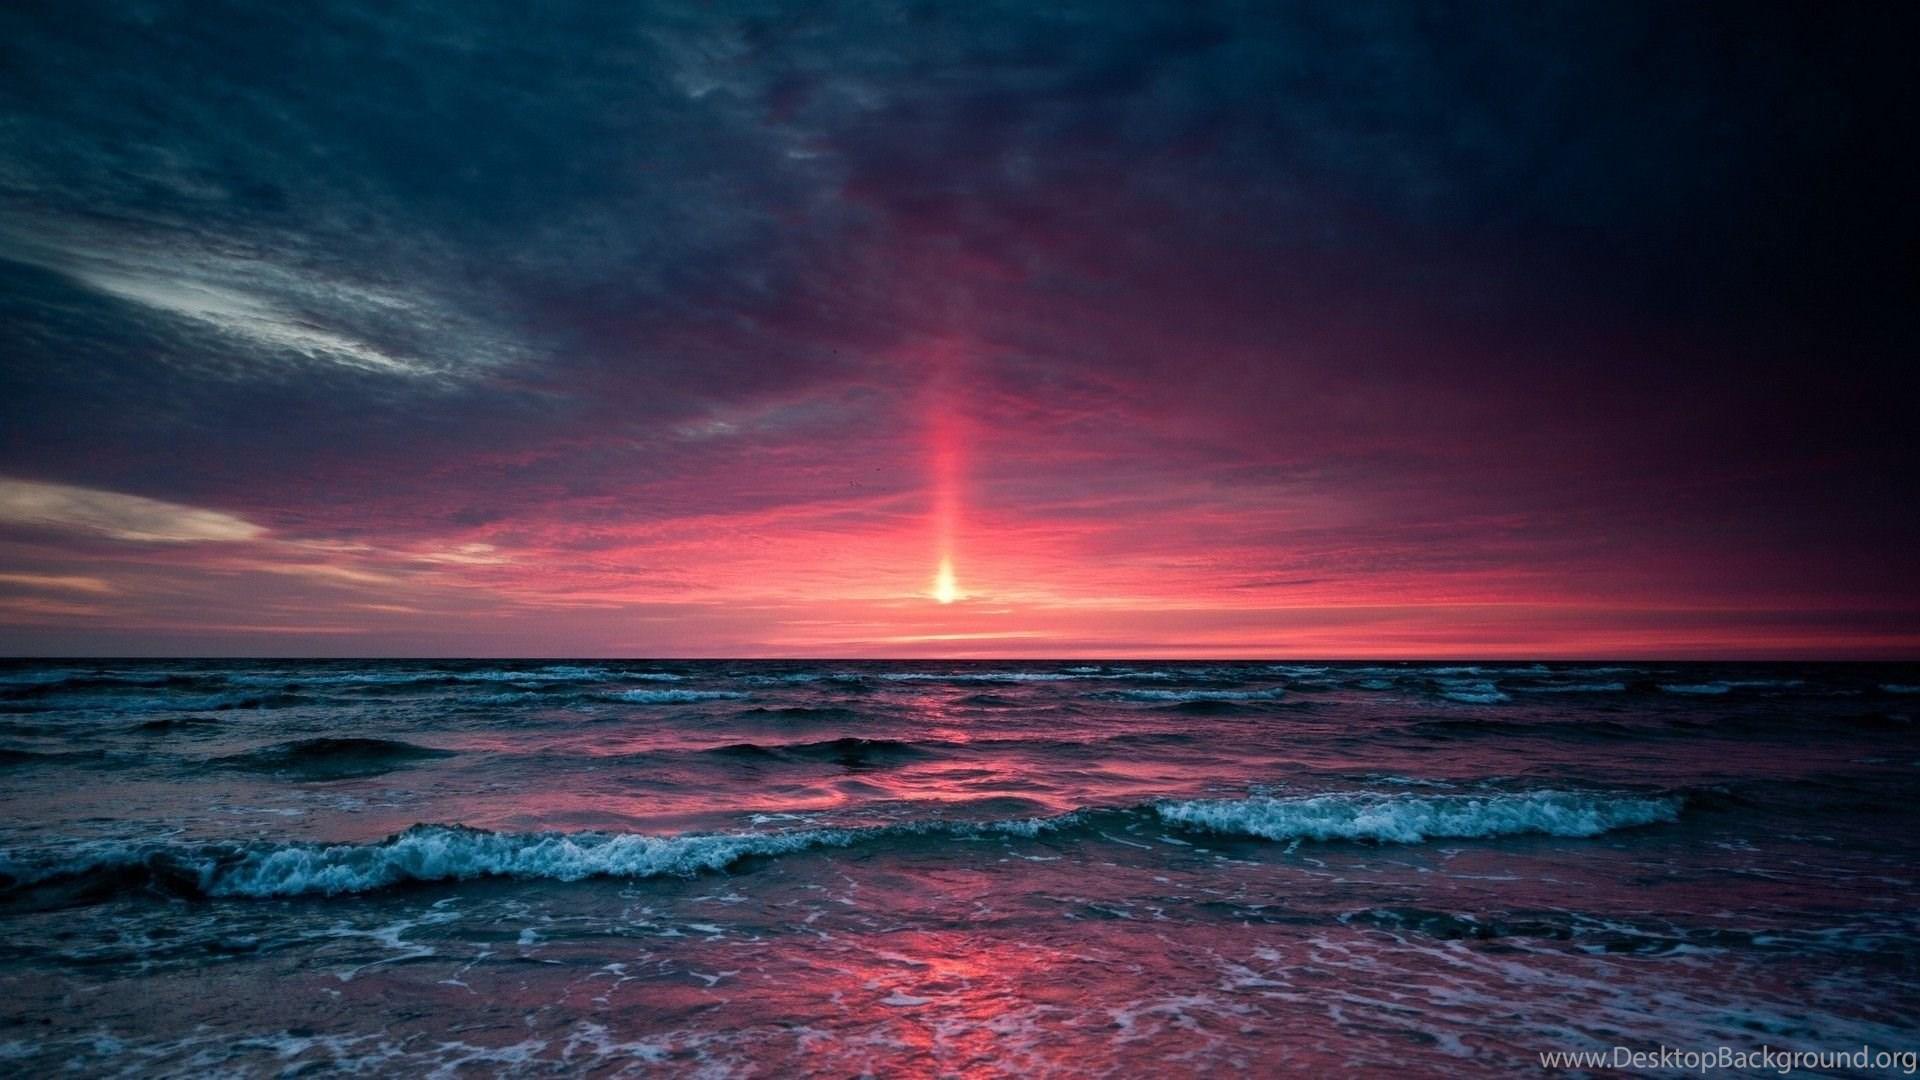 32246 ocean sunset desktop wallpapers hd wallpaper backgrounds